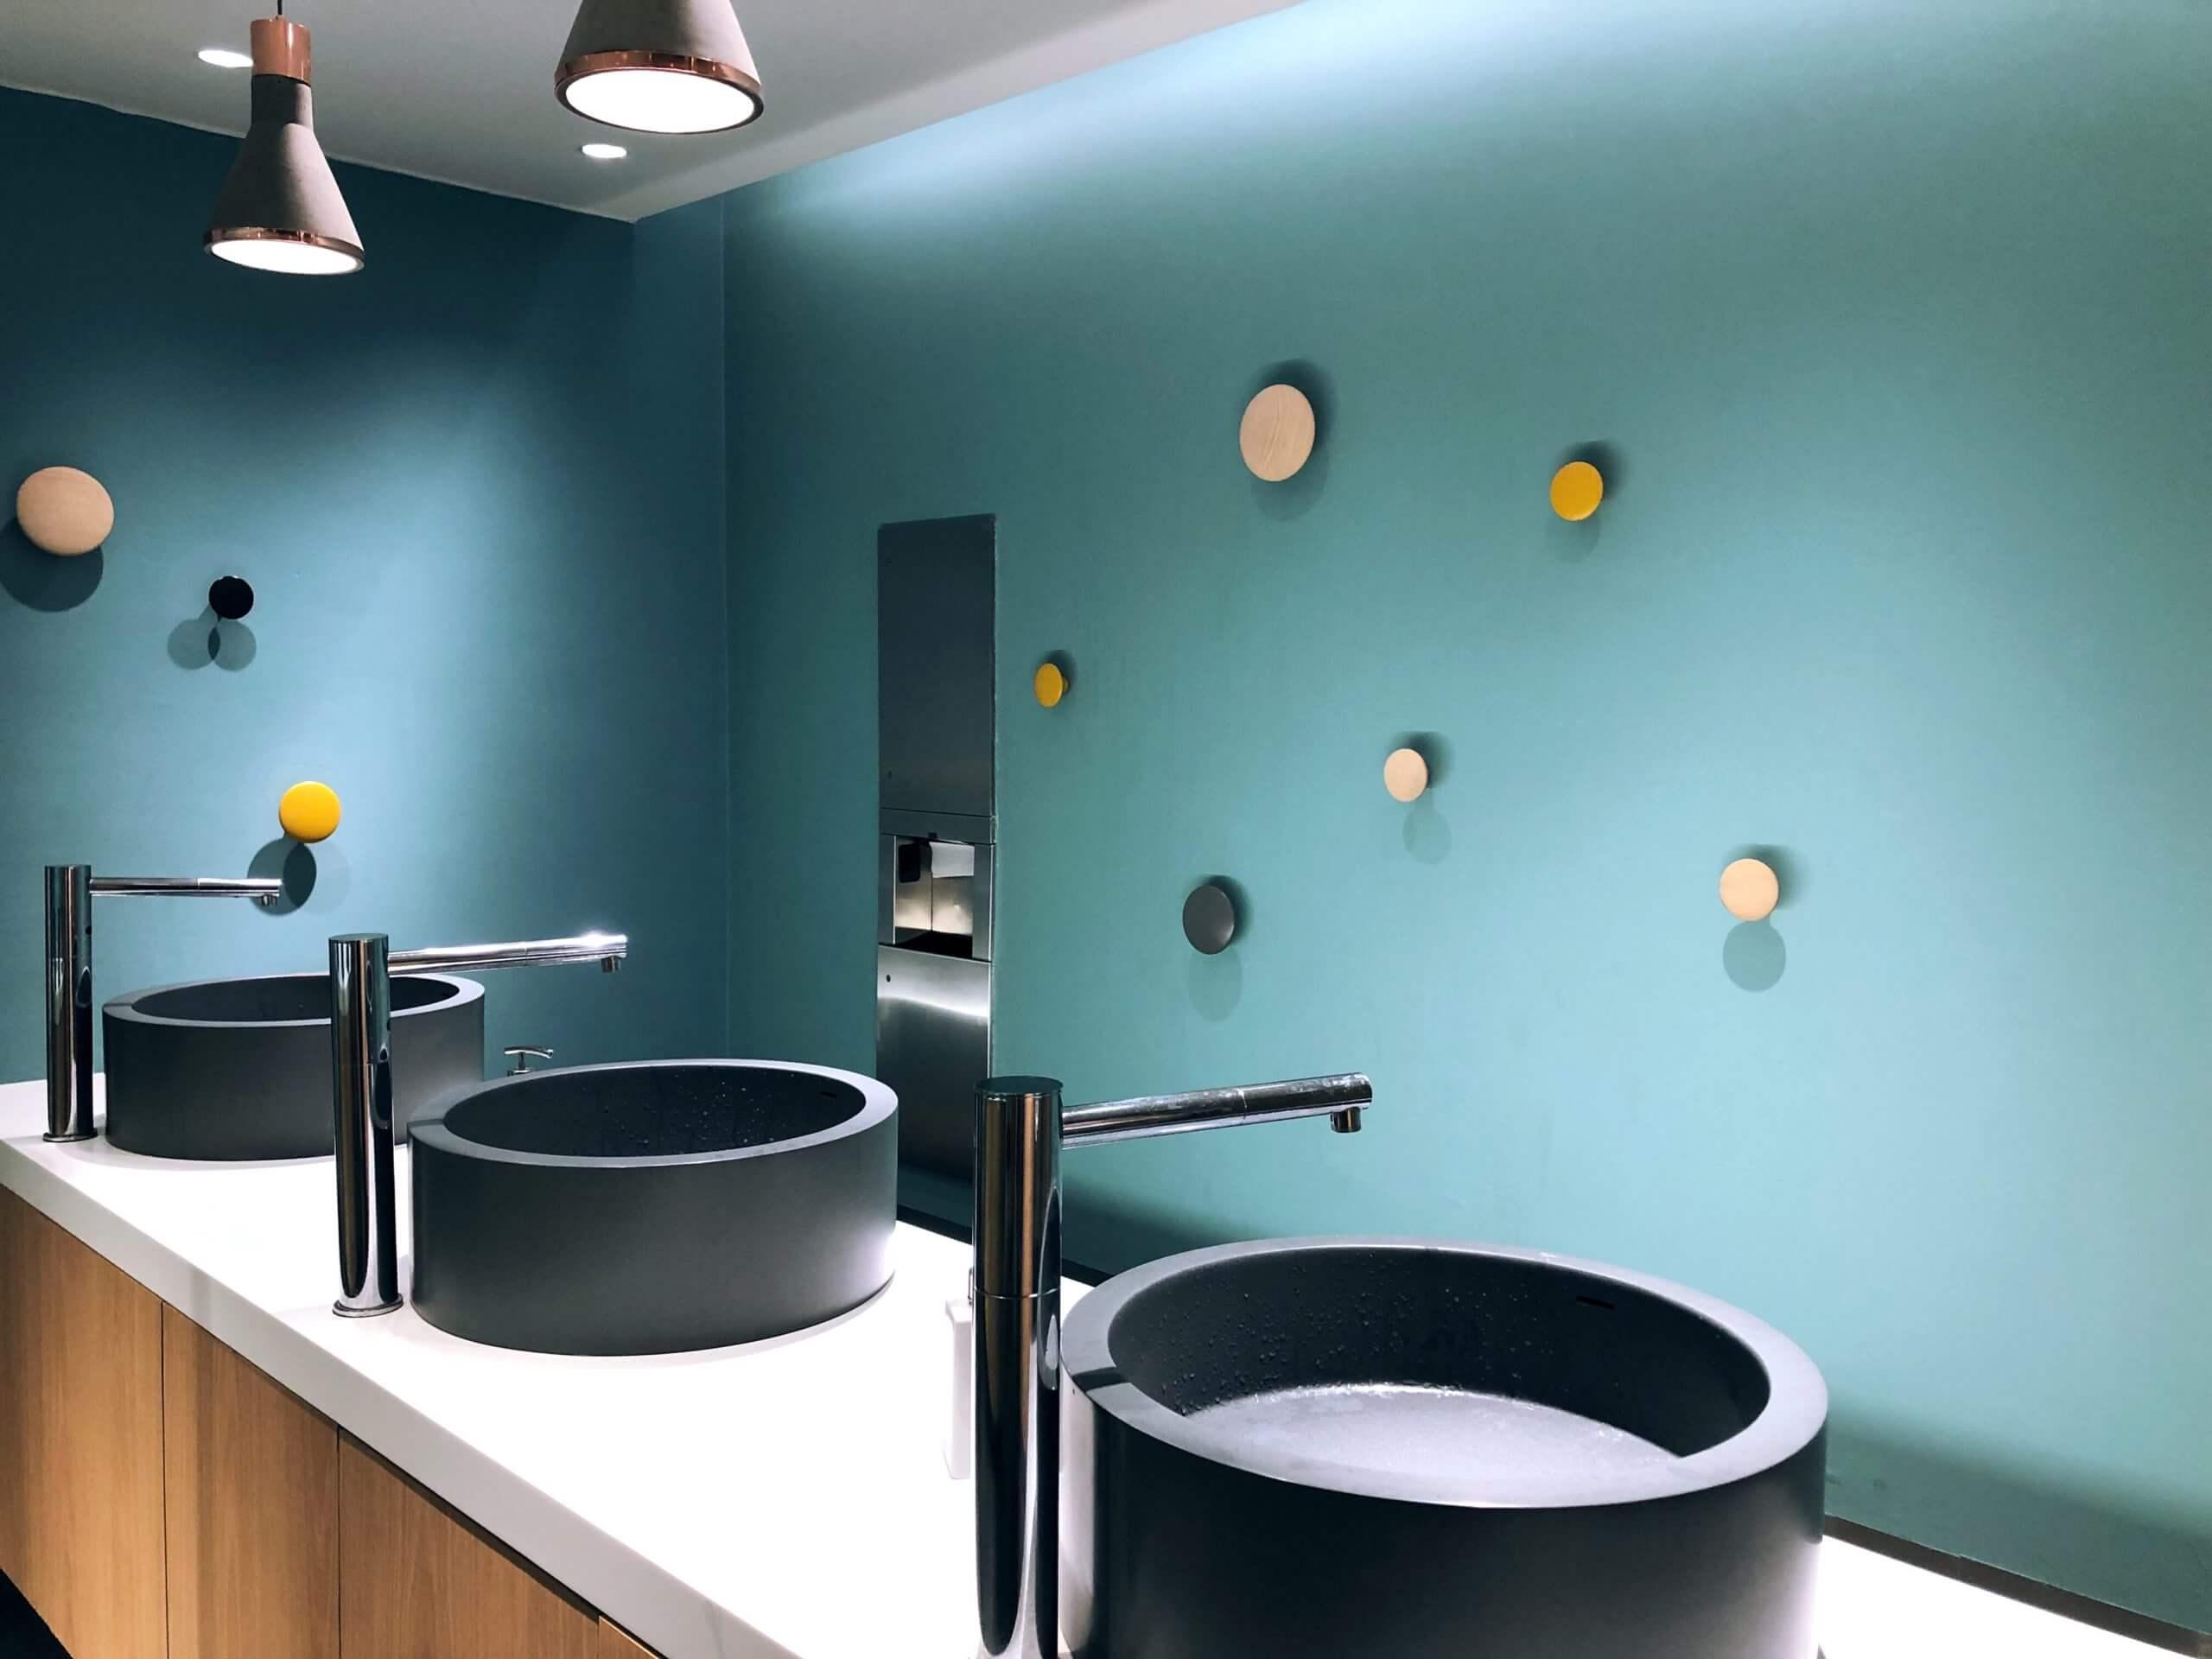 Brisbane Plumber bathroom repairs